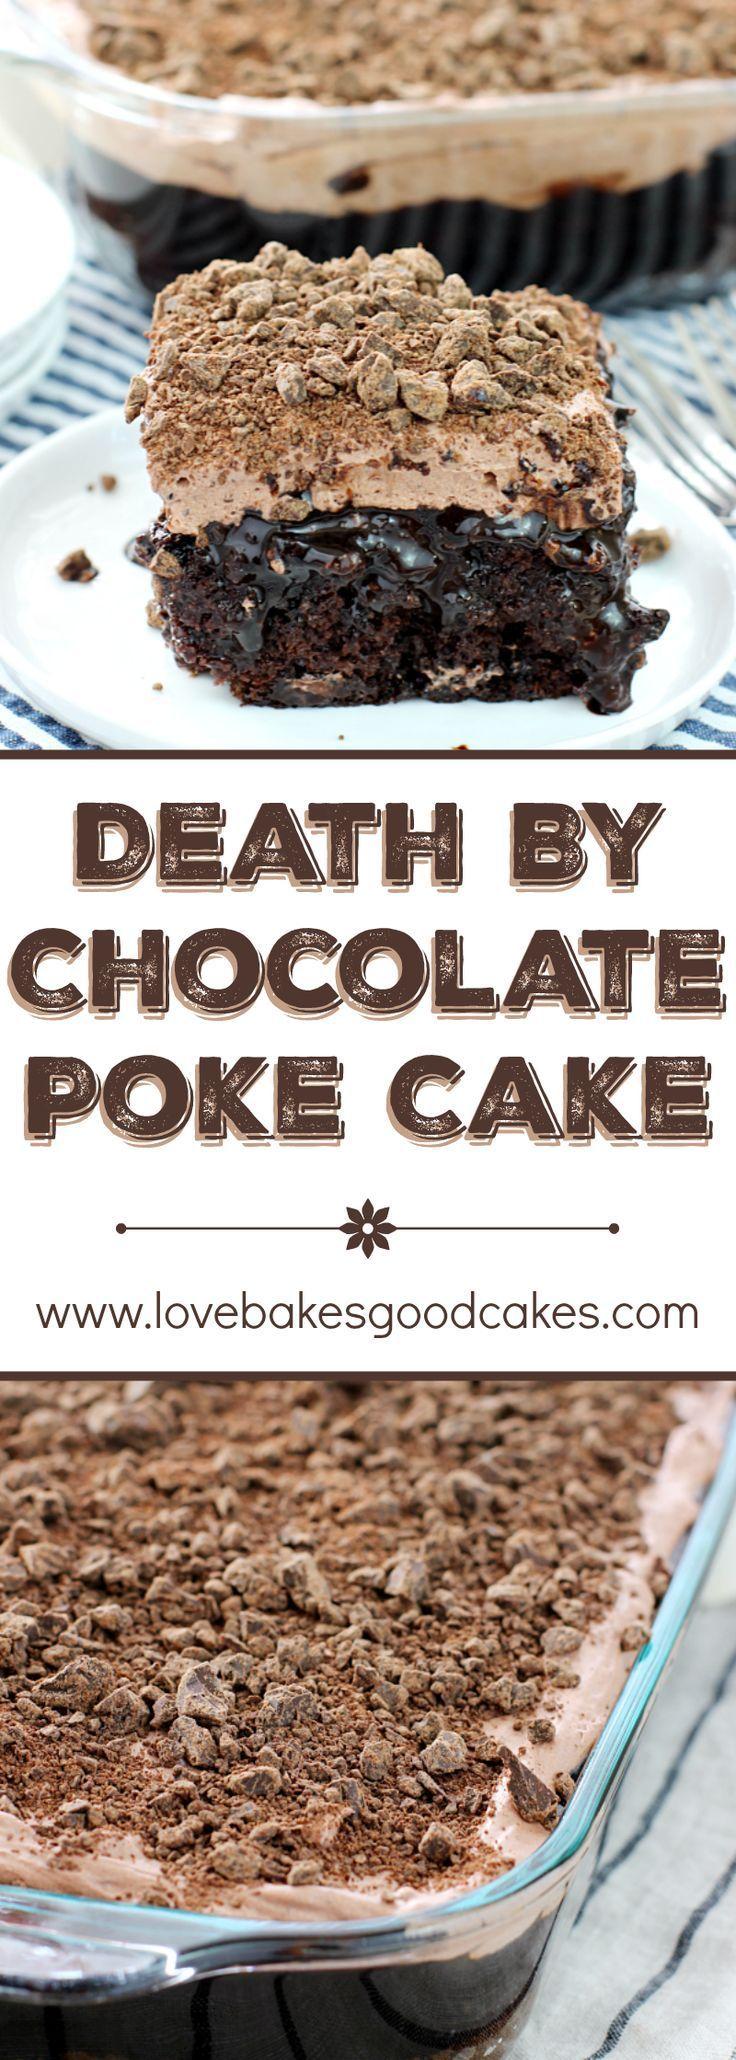 1214 best images about cakes recipes on pinterest. Black Bedroom Furniture Sets. Home Design Ideas